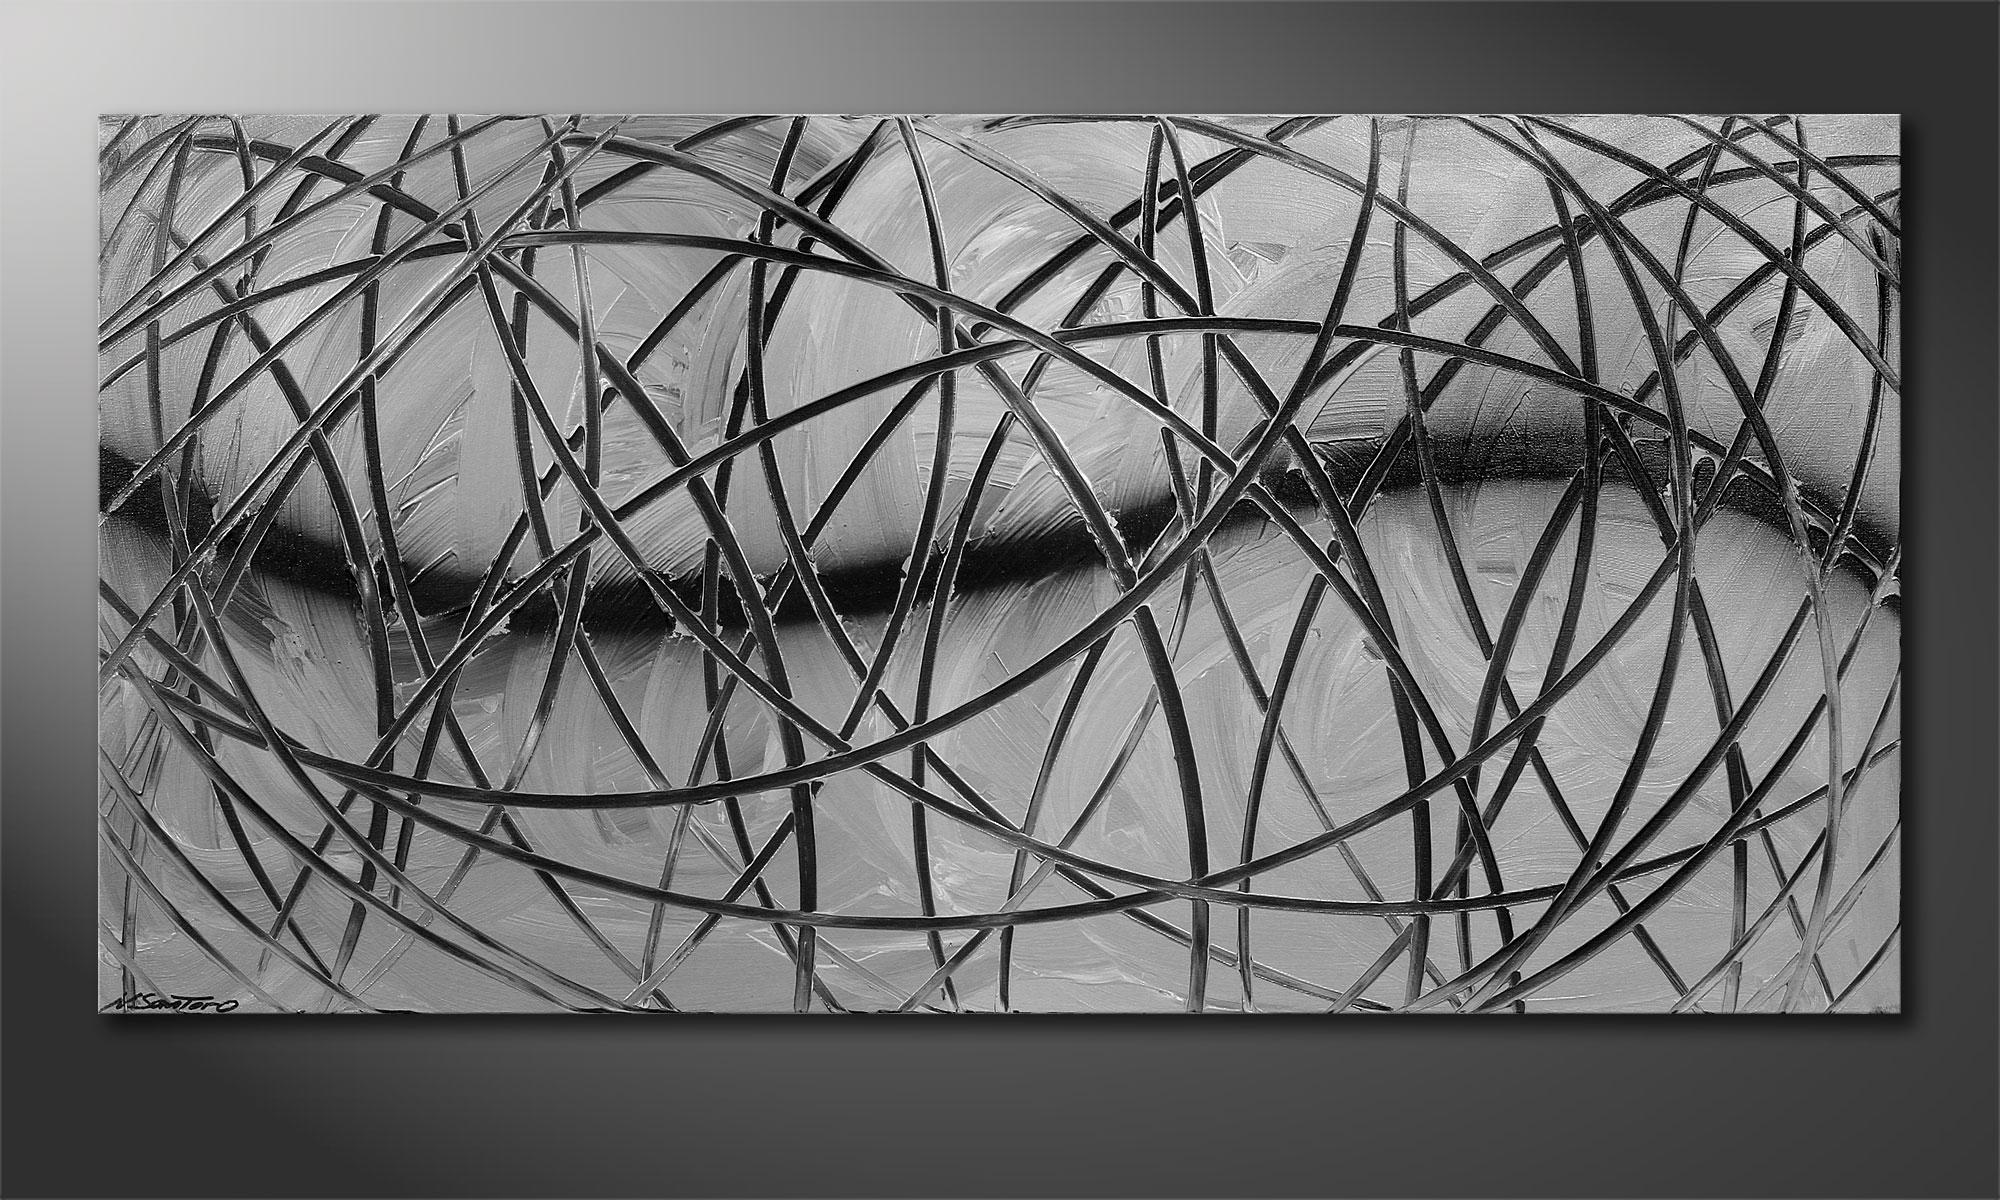 Full Size of Wandbilder Wohnzimmer Modern Xxl Sofa U Form Esstisch Vinylboden Beleuchtung Deckenleuchten Modernes Bett Led Lampen Bilder Küche Holz Decken Moderne Wohnzimmer Wandbilder Wohnzimmer Modern Xxl